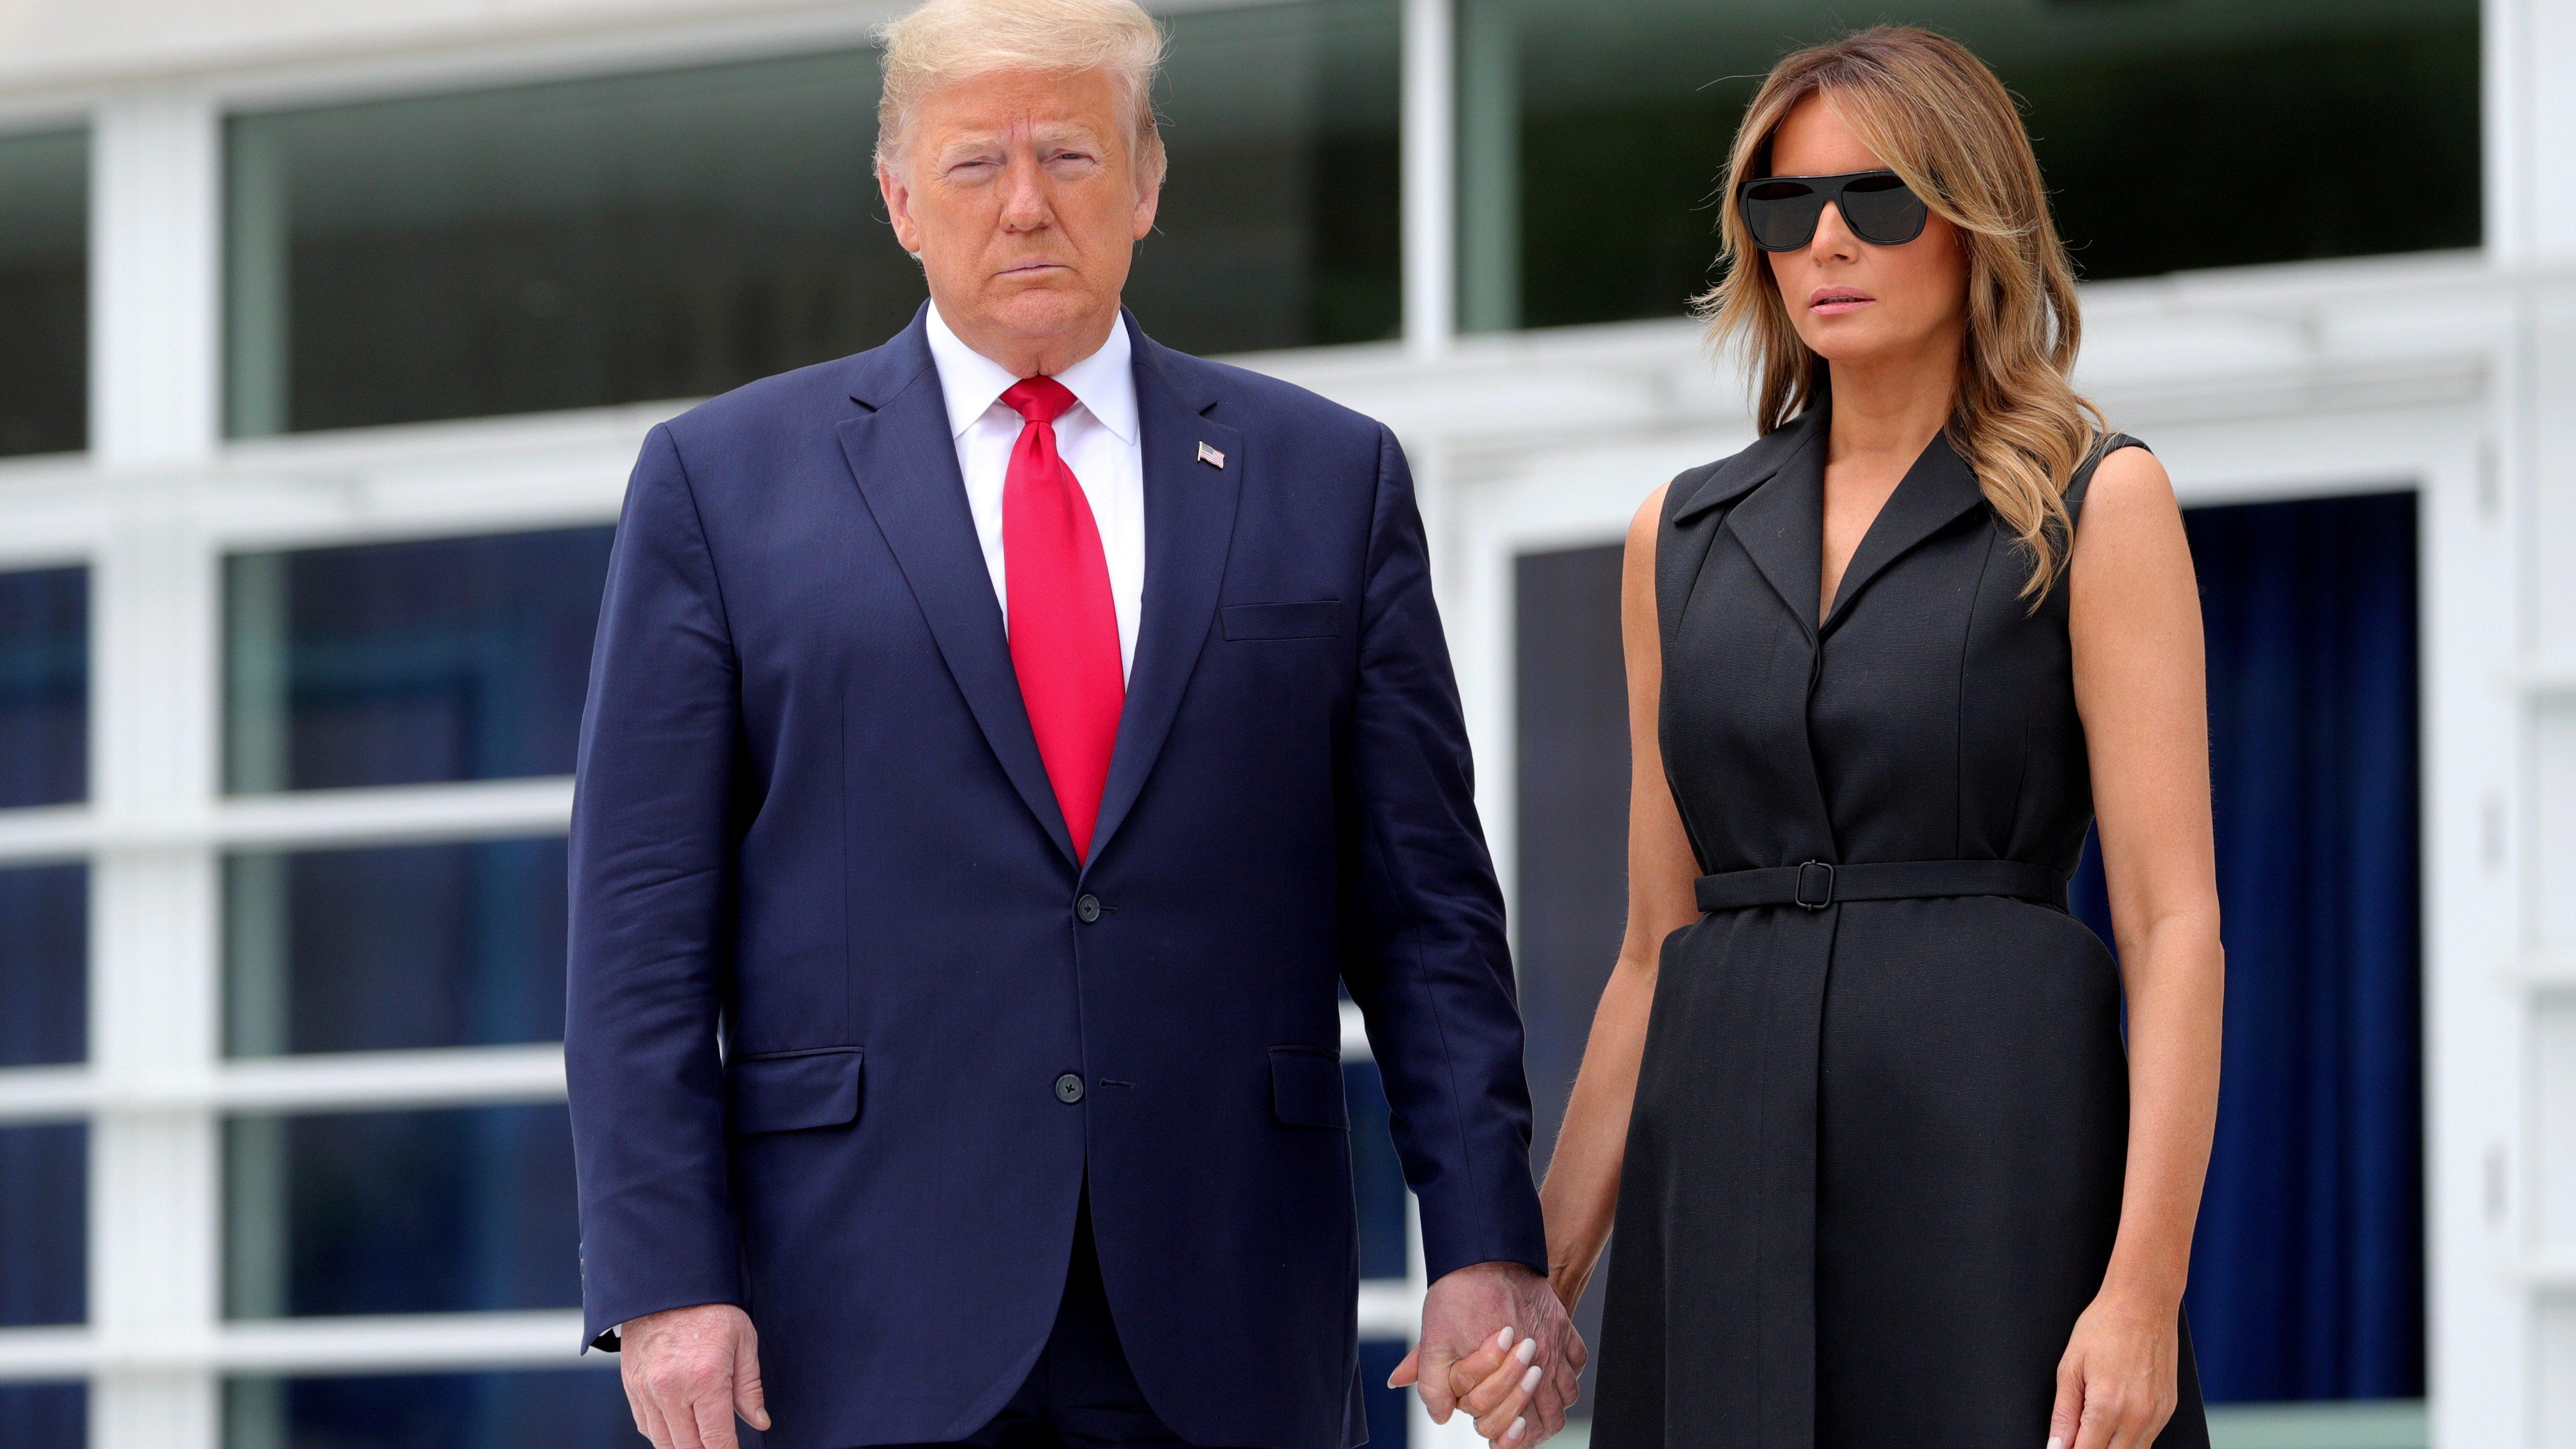 Trump and Melanie